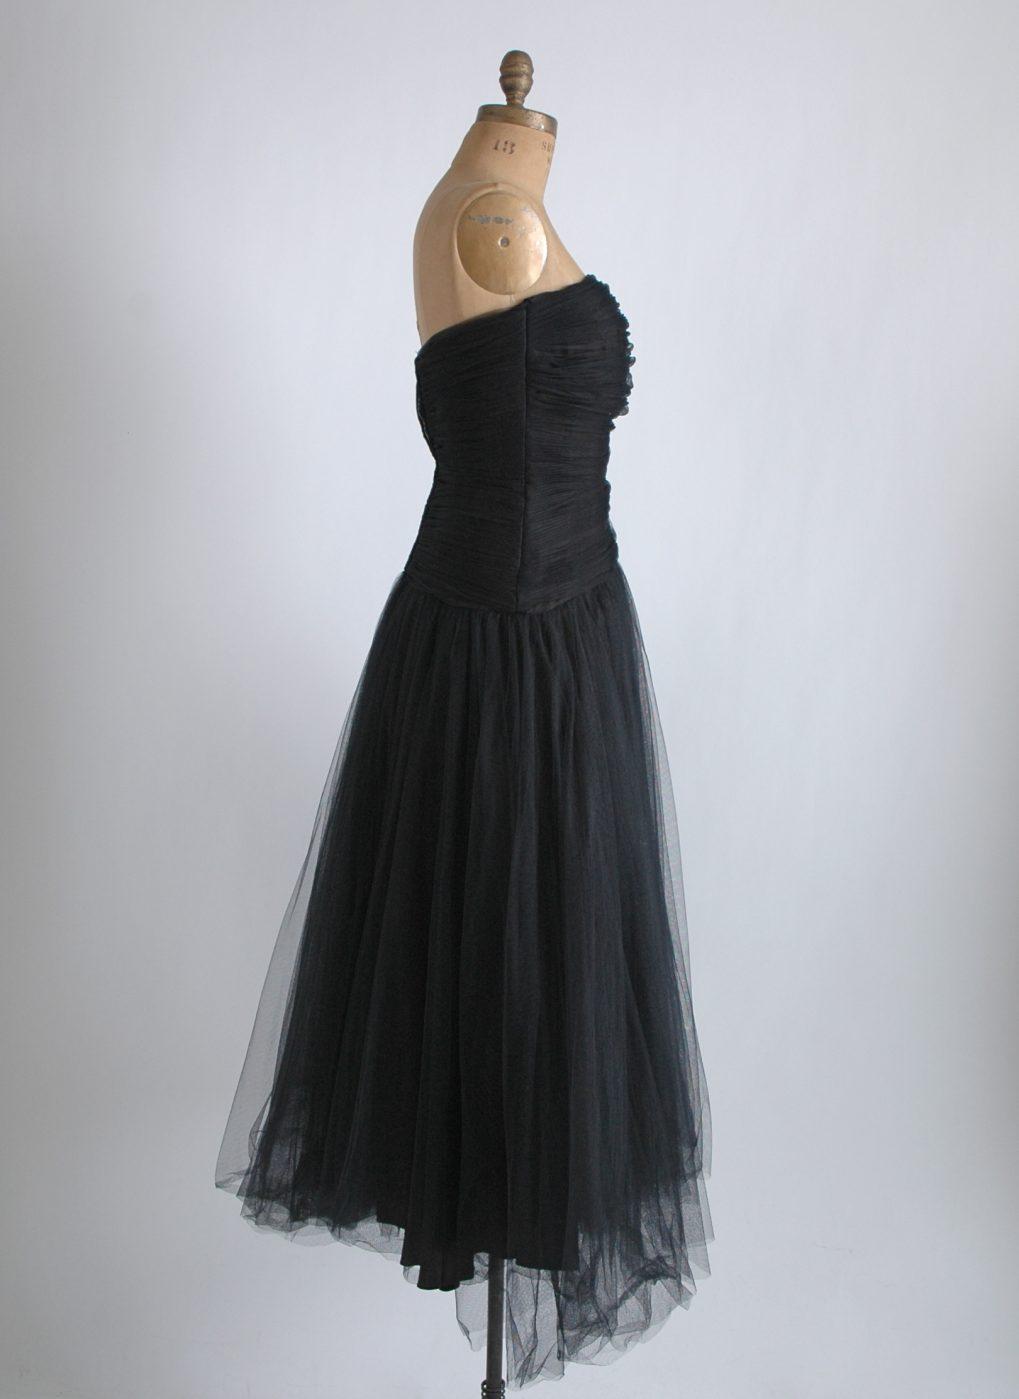 1950s Helena Barbieri ruched dress